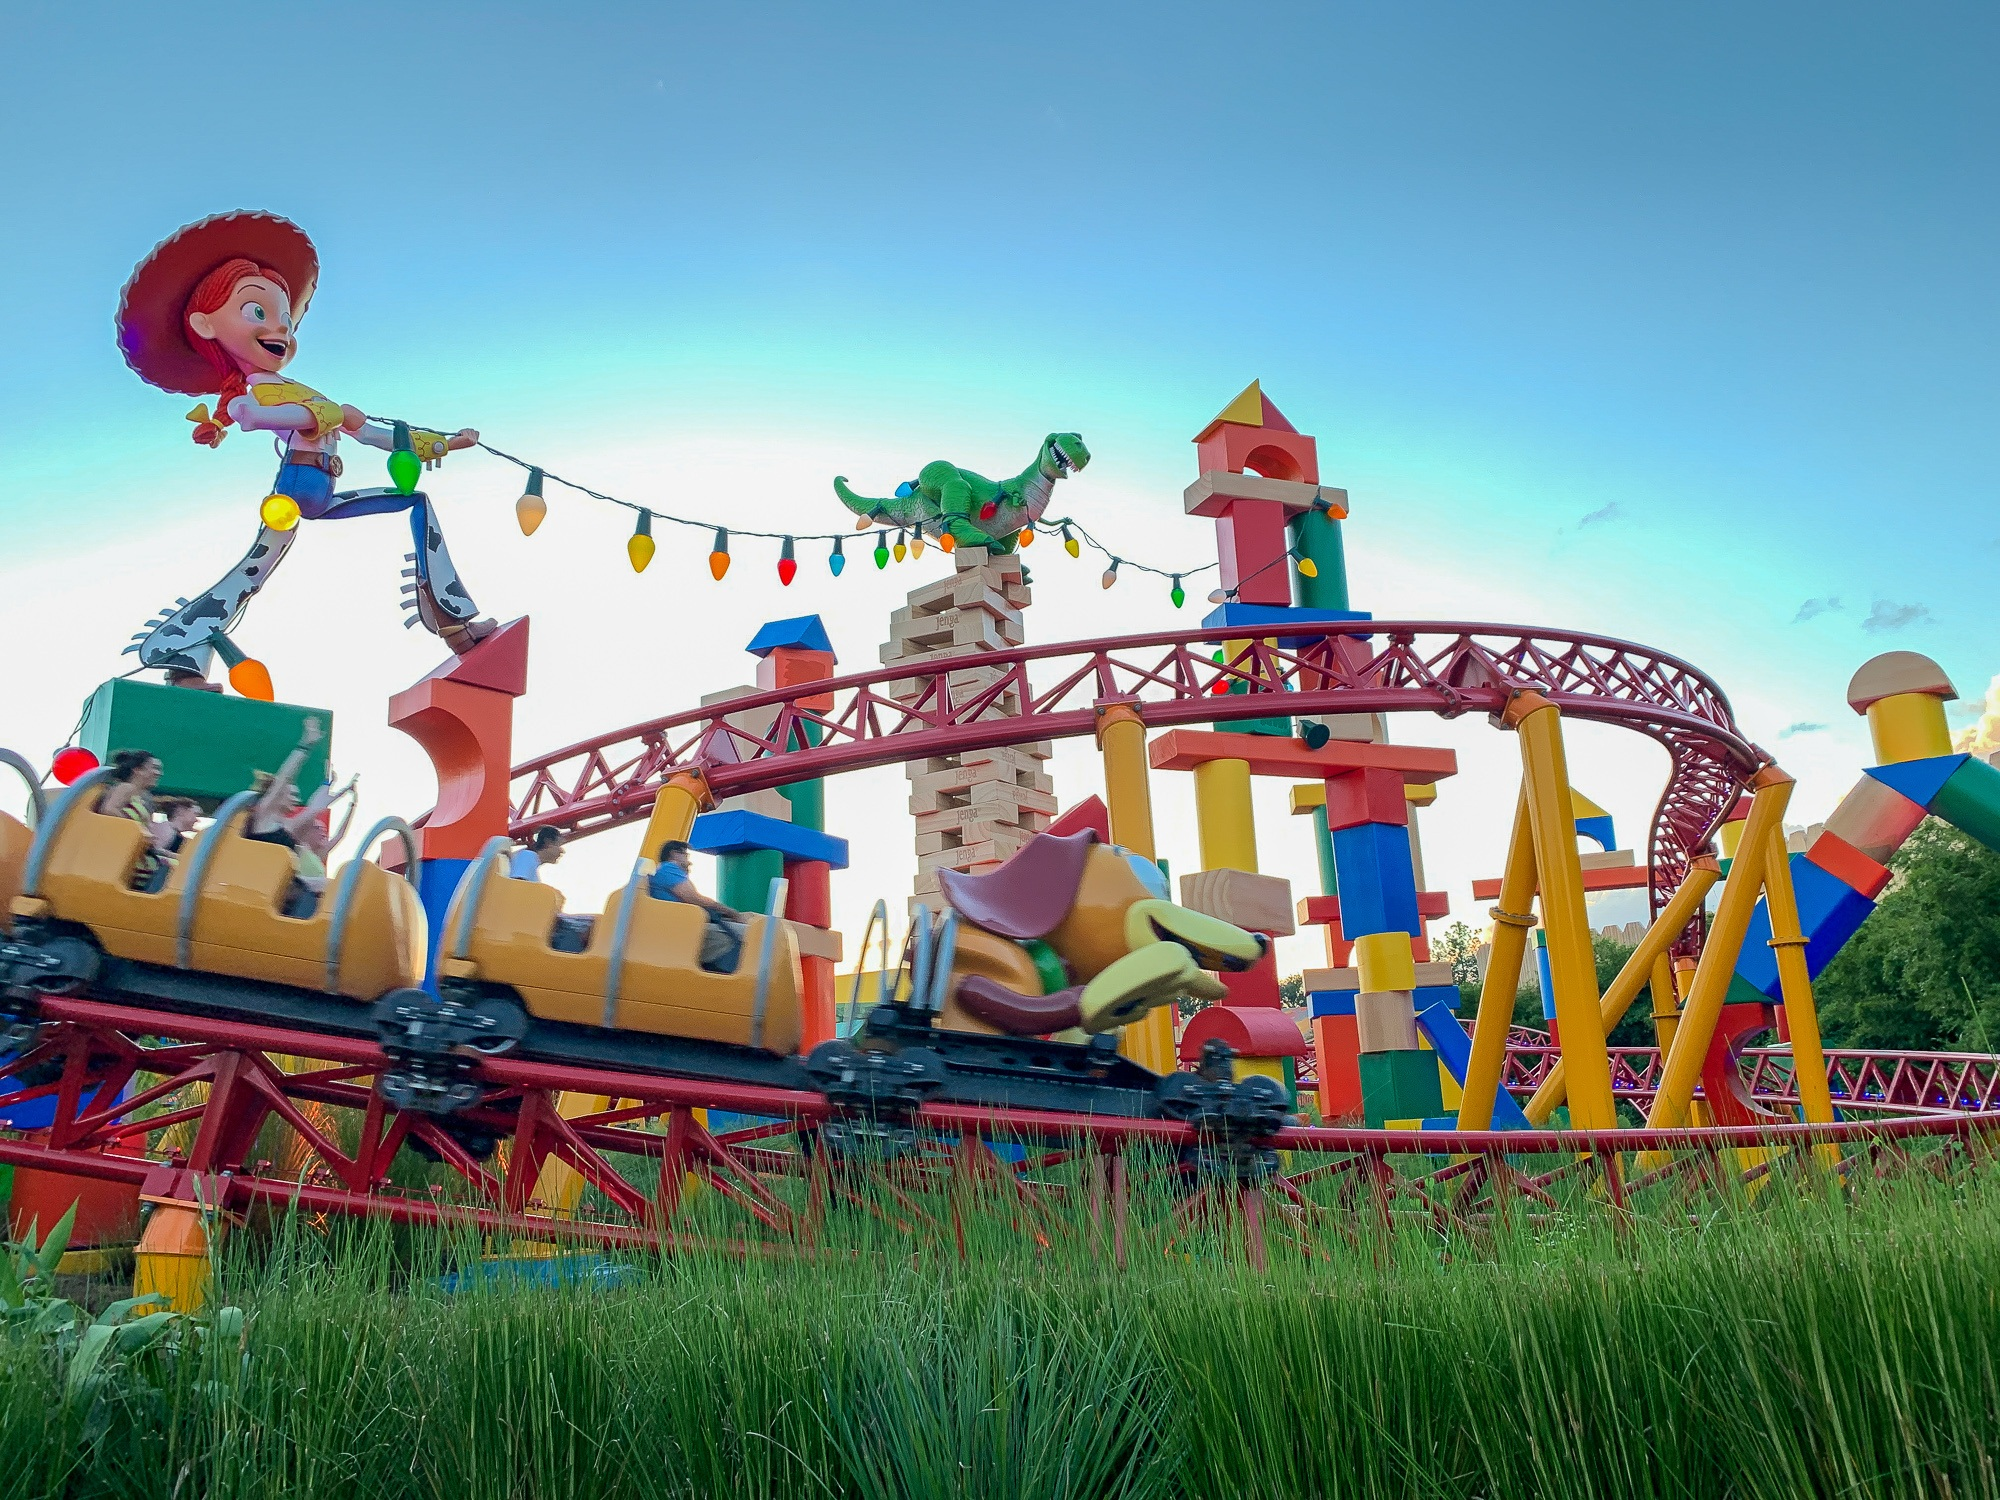 Slinky Dog Dash roller coaster at Disney's Hollywood Studios